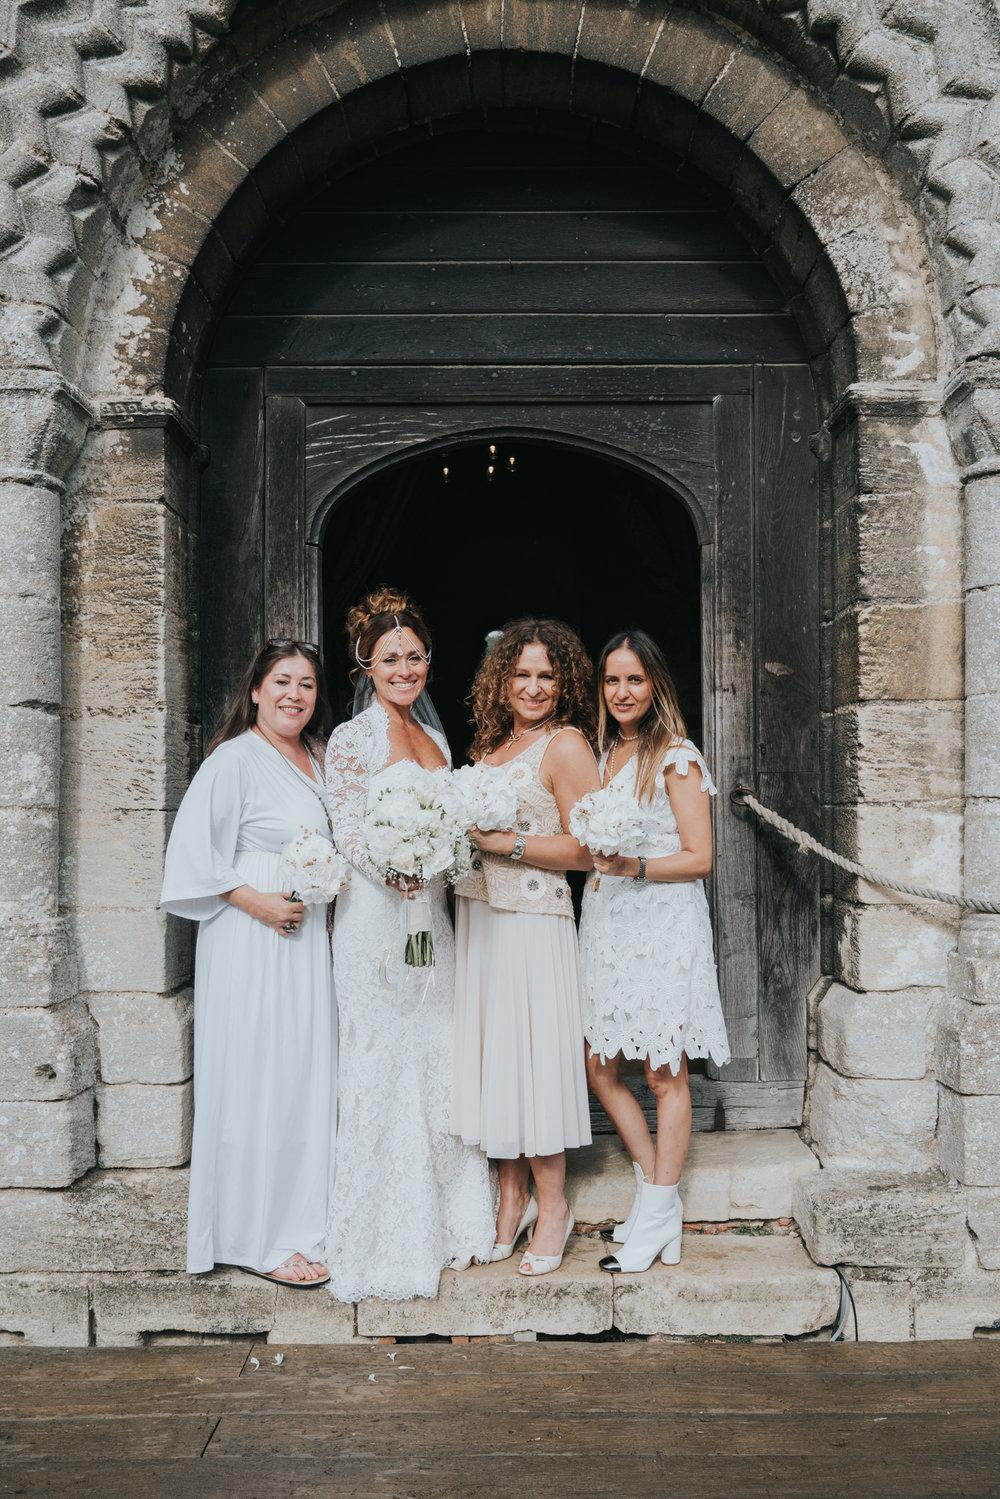 grace-elizabeth-boho-wedding-headingham-castle-essex-wedding-photographer-60.jpg